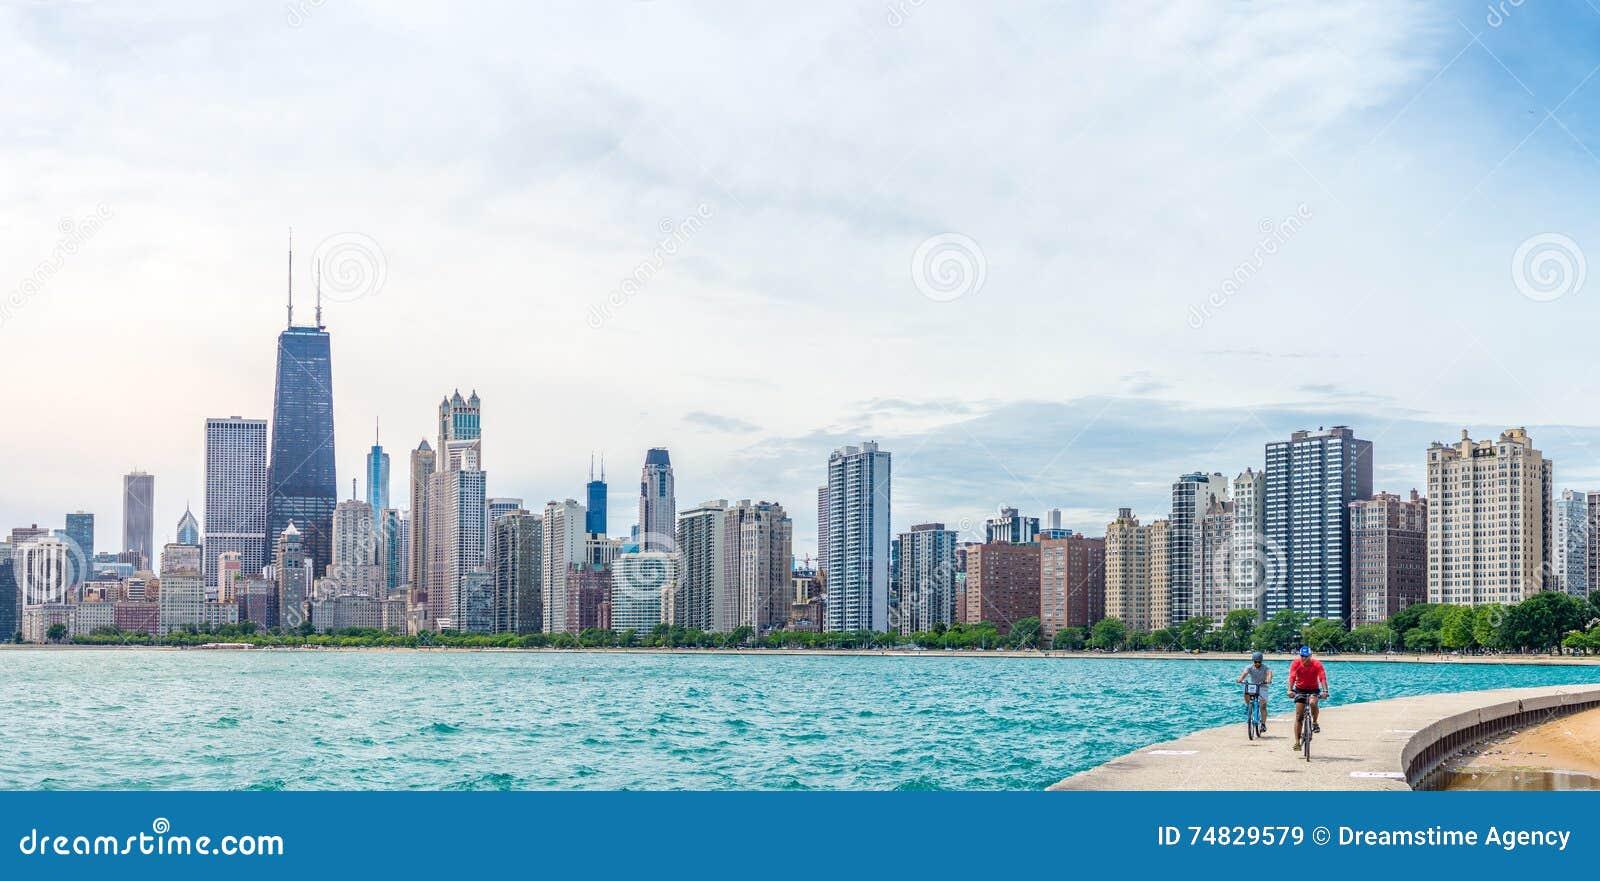 Estate in Chicago